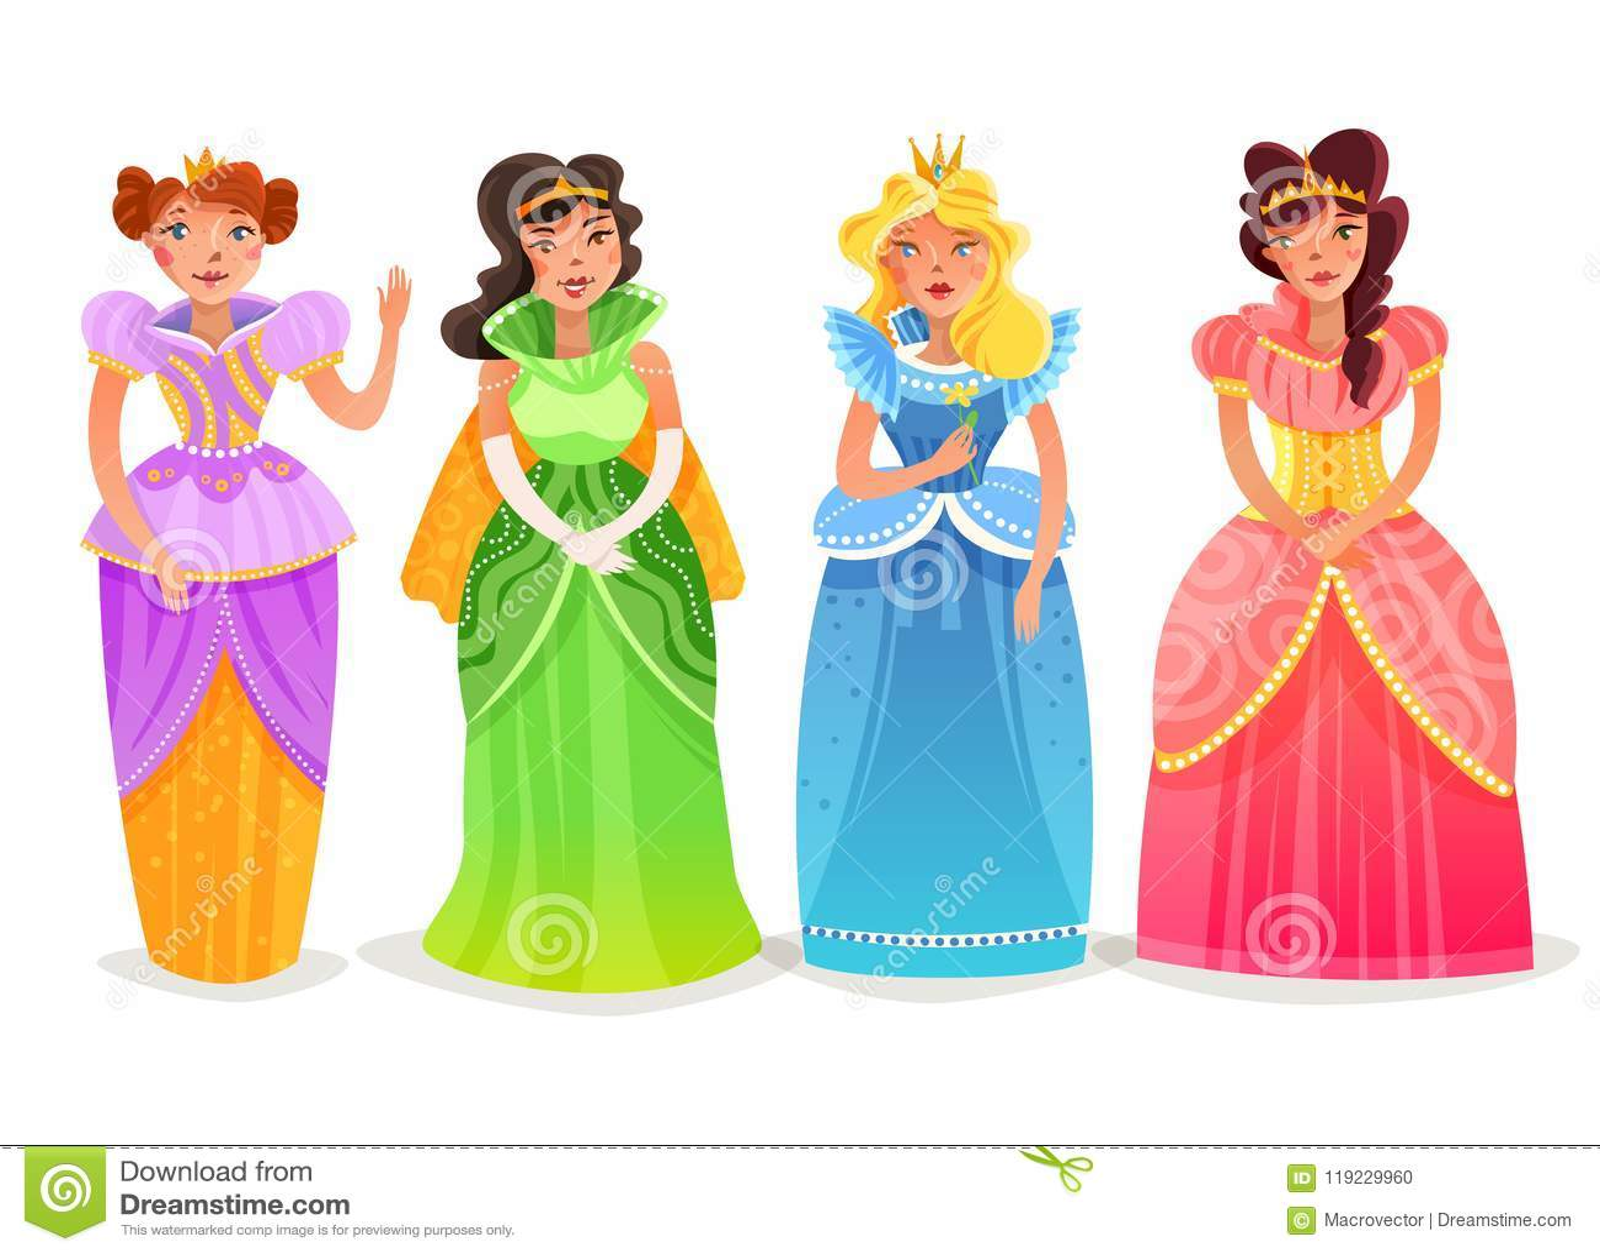 Princesas Desenhos Animados Ajuste Ilustracao Do Vetor